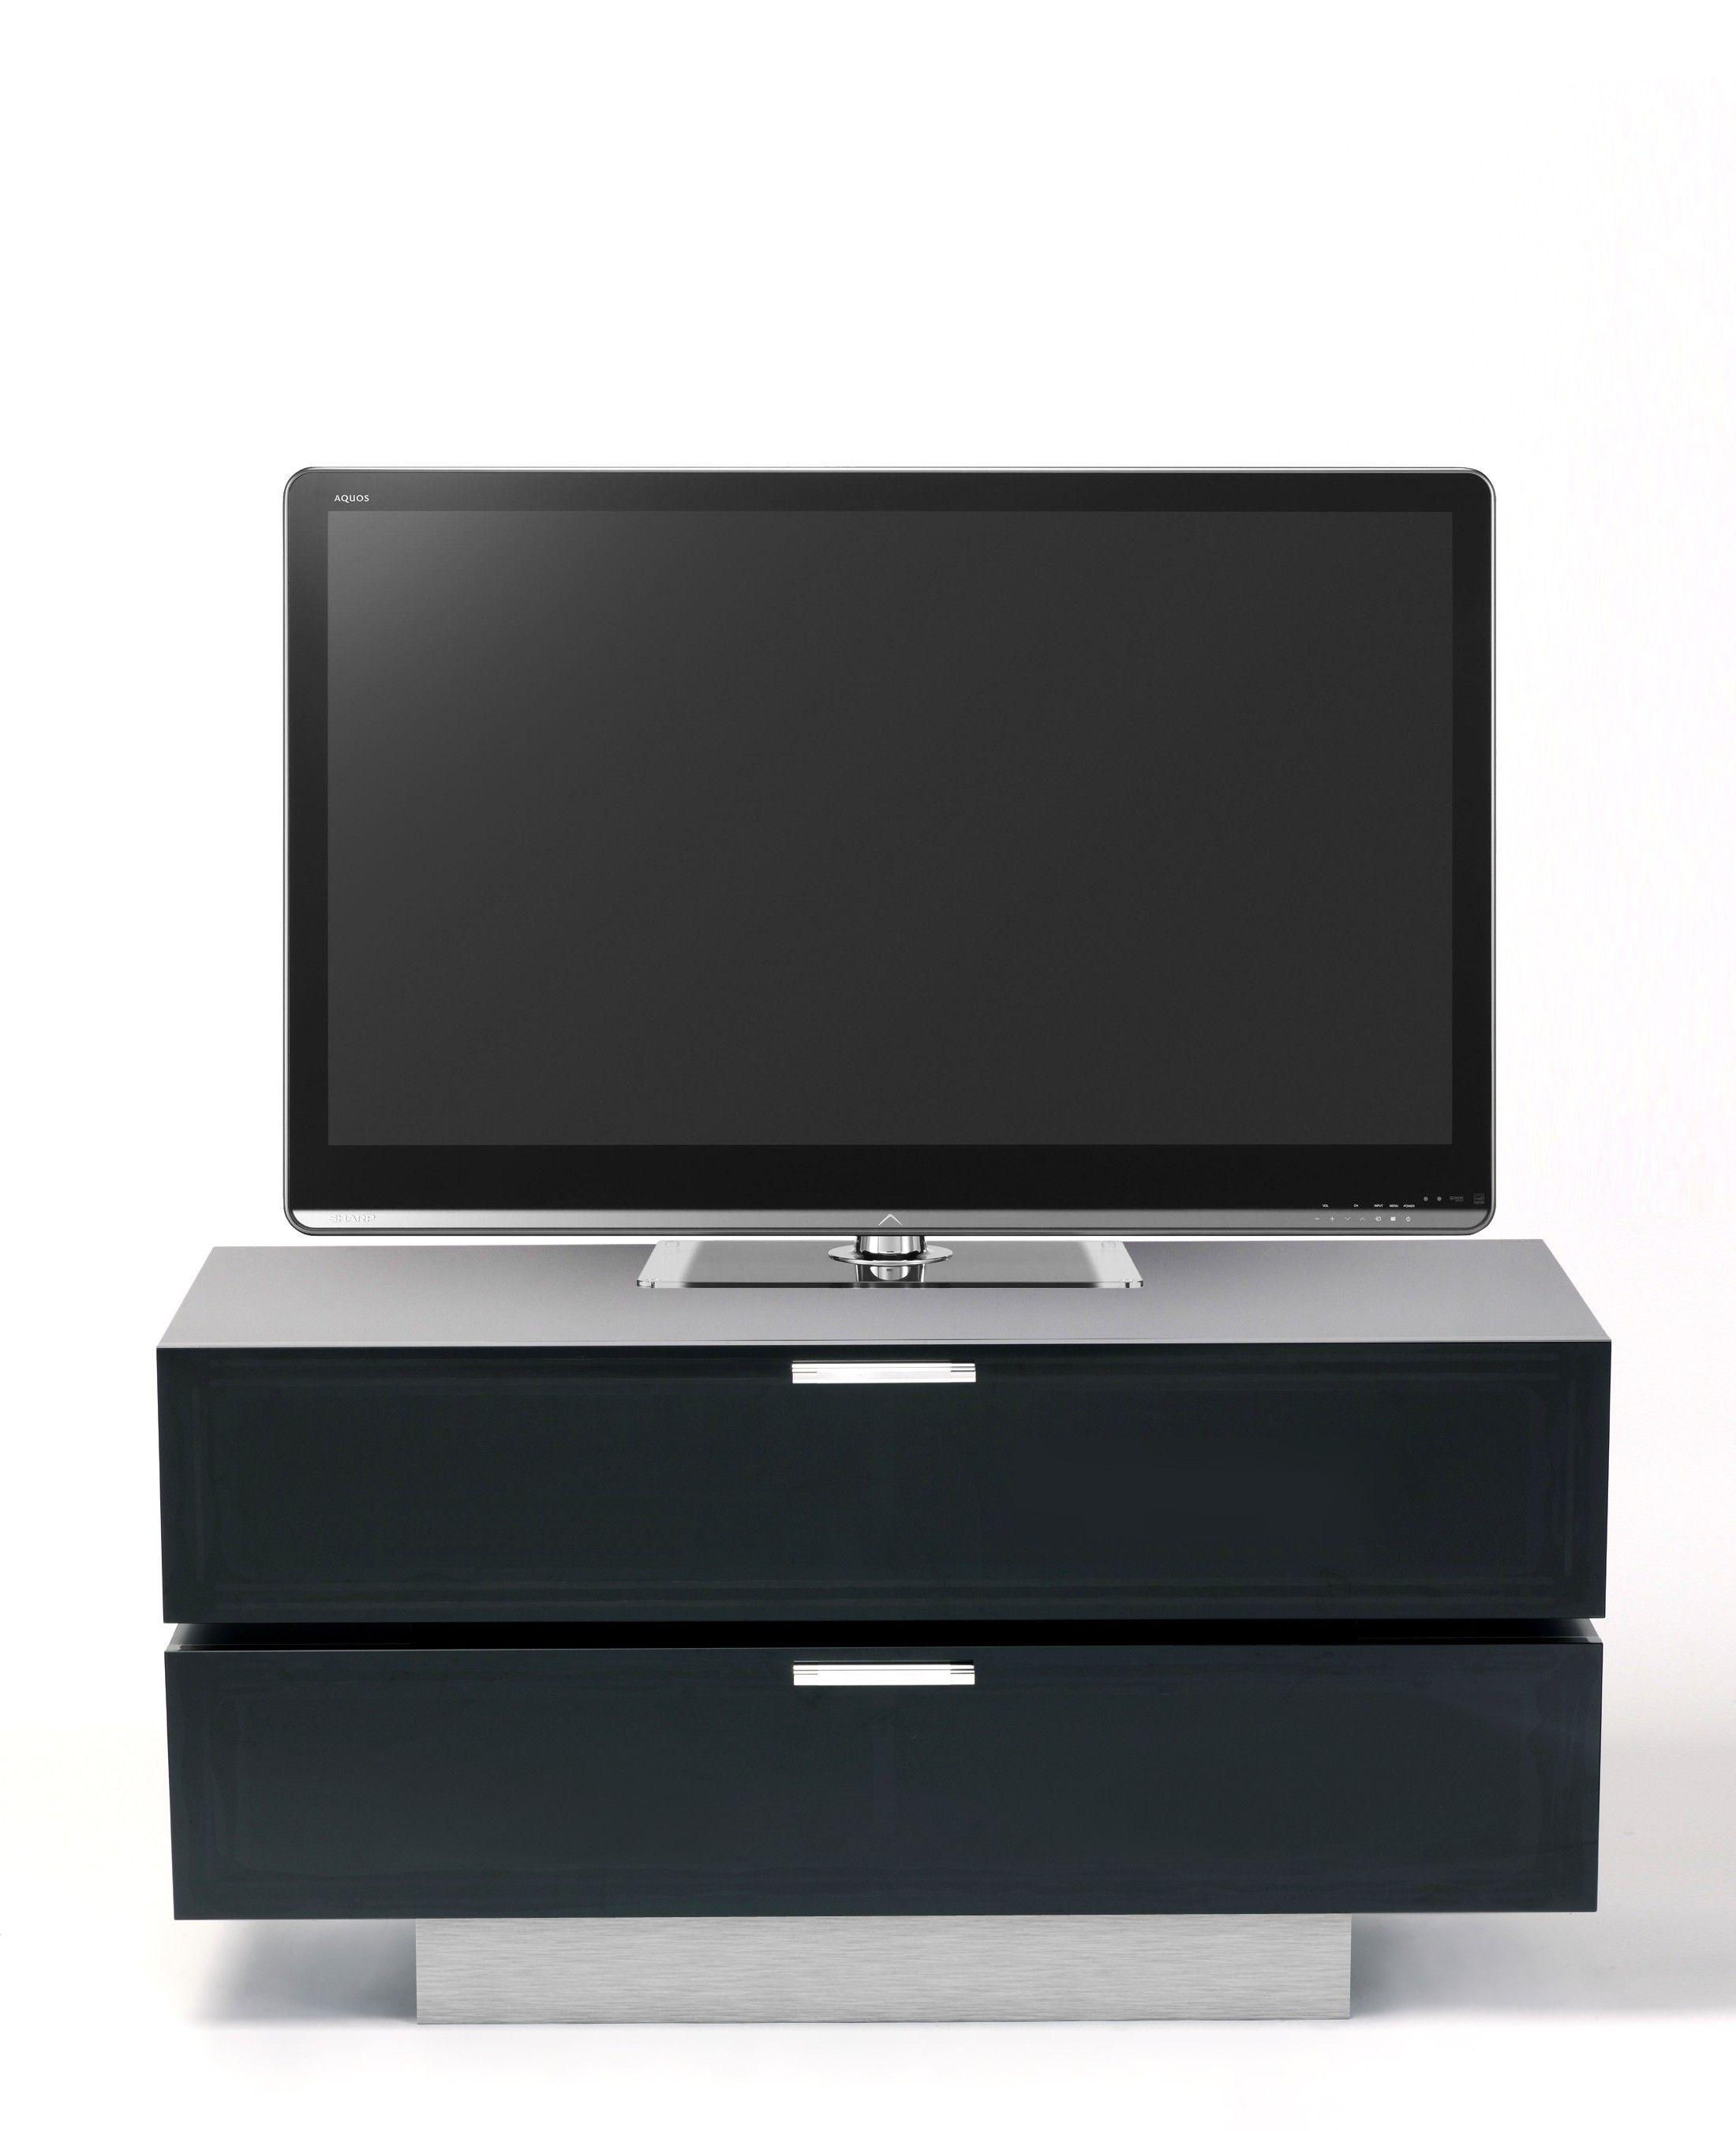 Stil Stand Black Gloss TV with Alu Plinth STUK4001